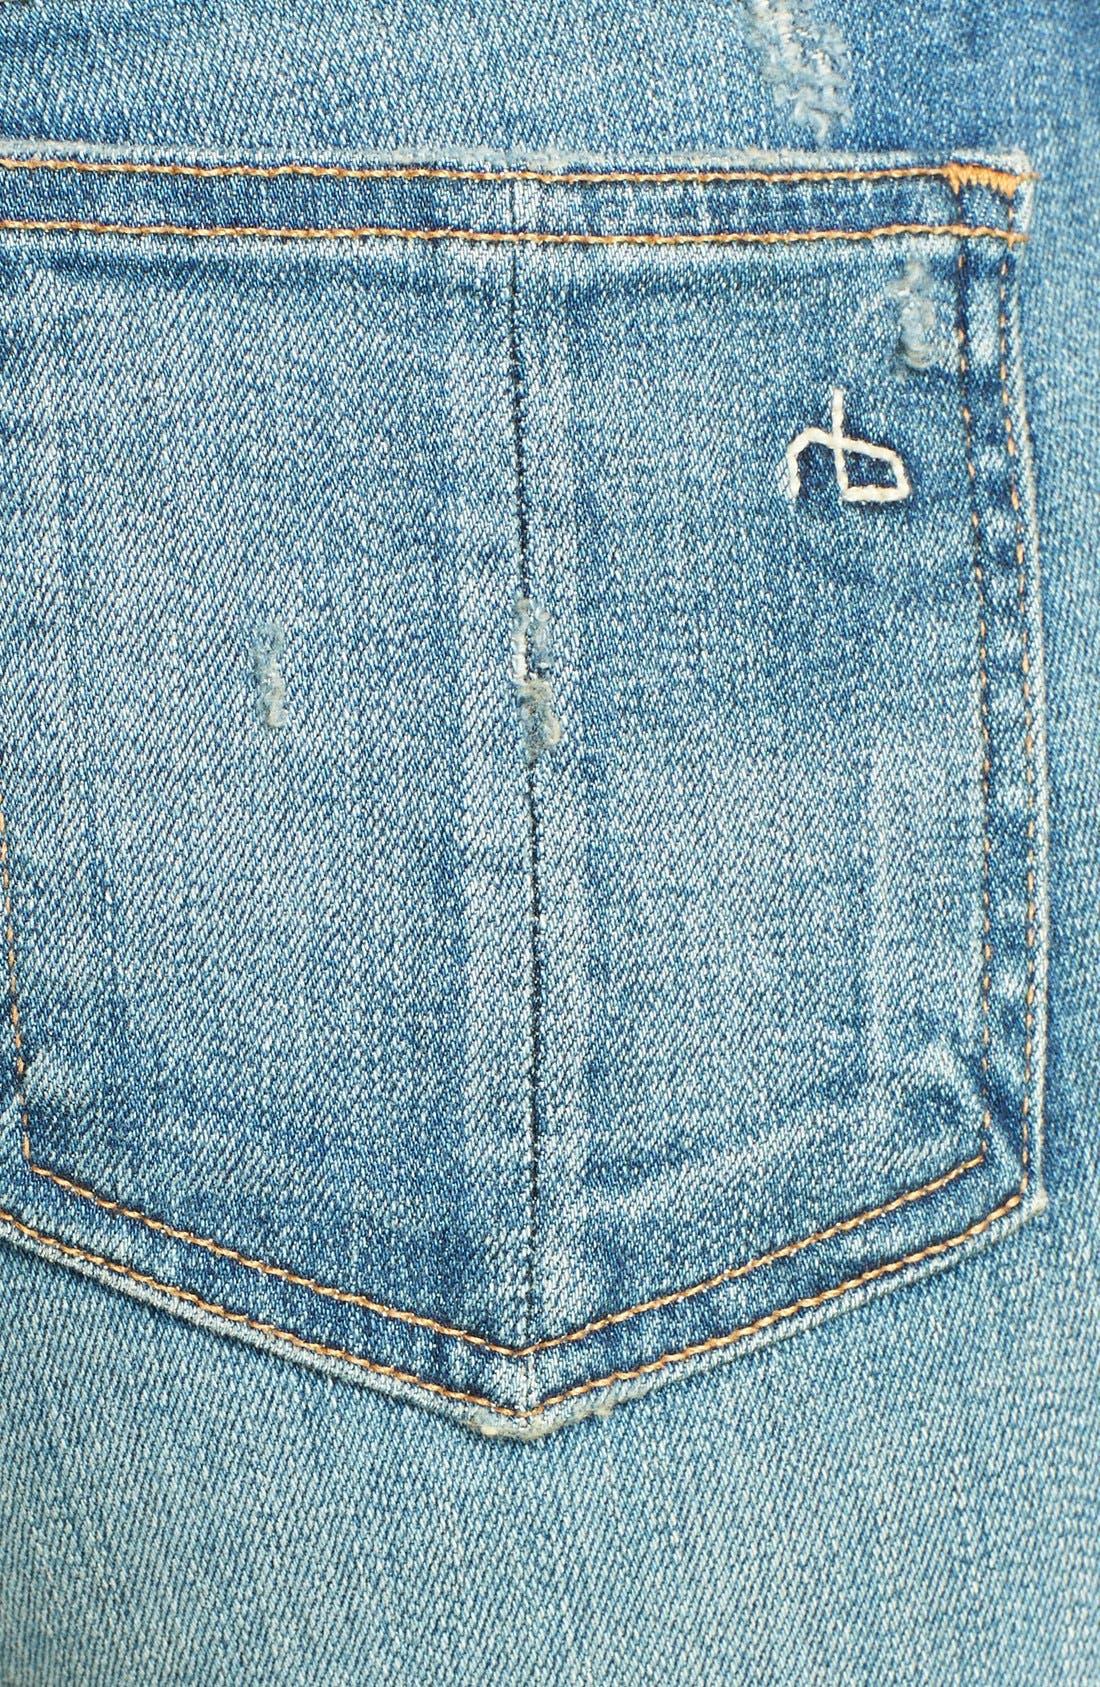 Alternate Image 3  - rag & bone/JEAN Stretch Skinny Jeans